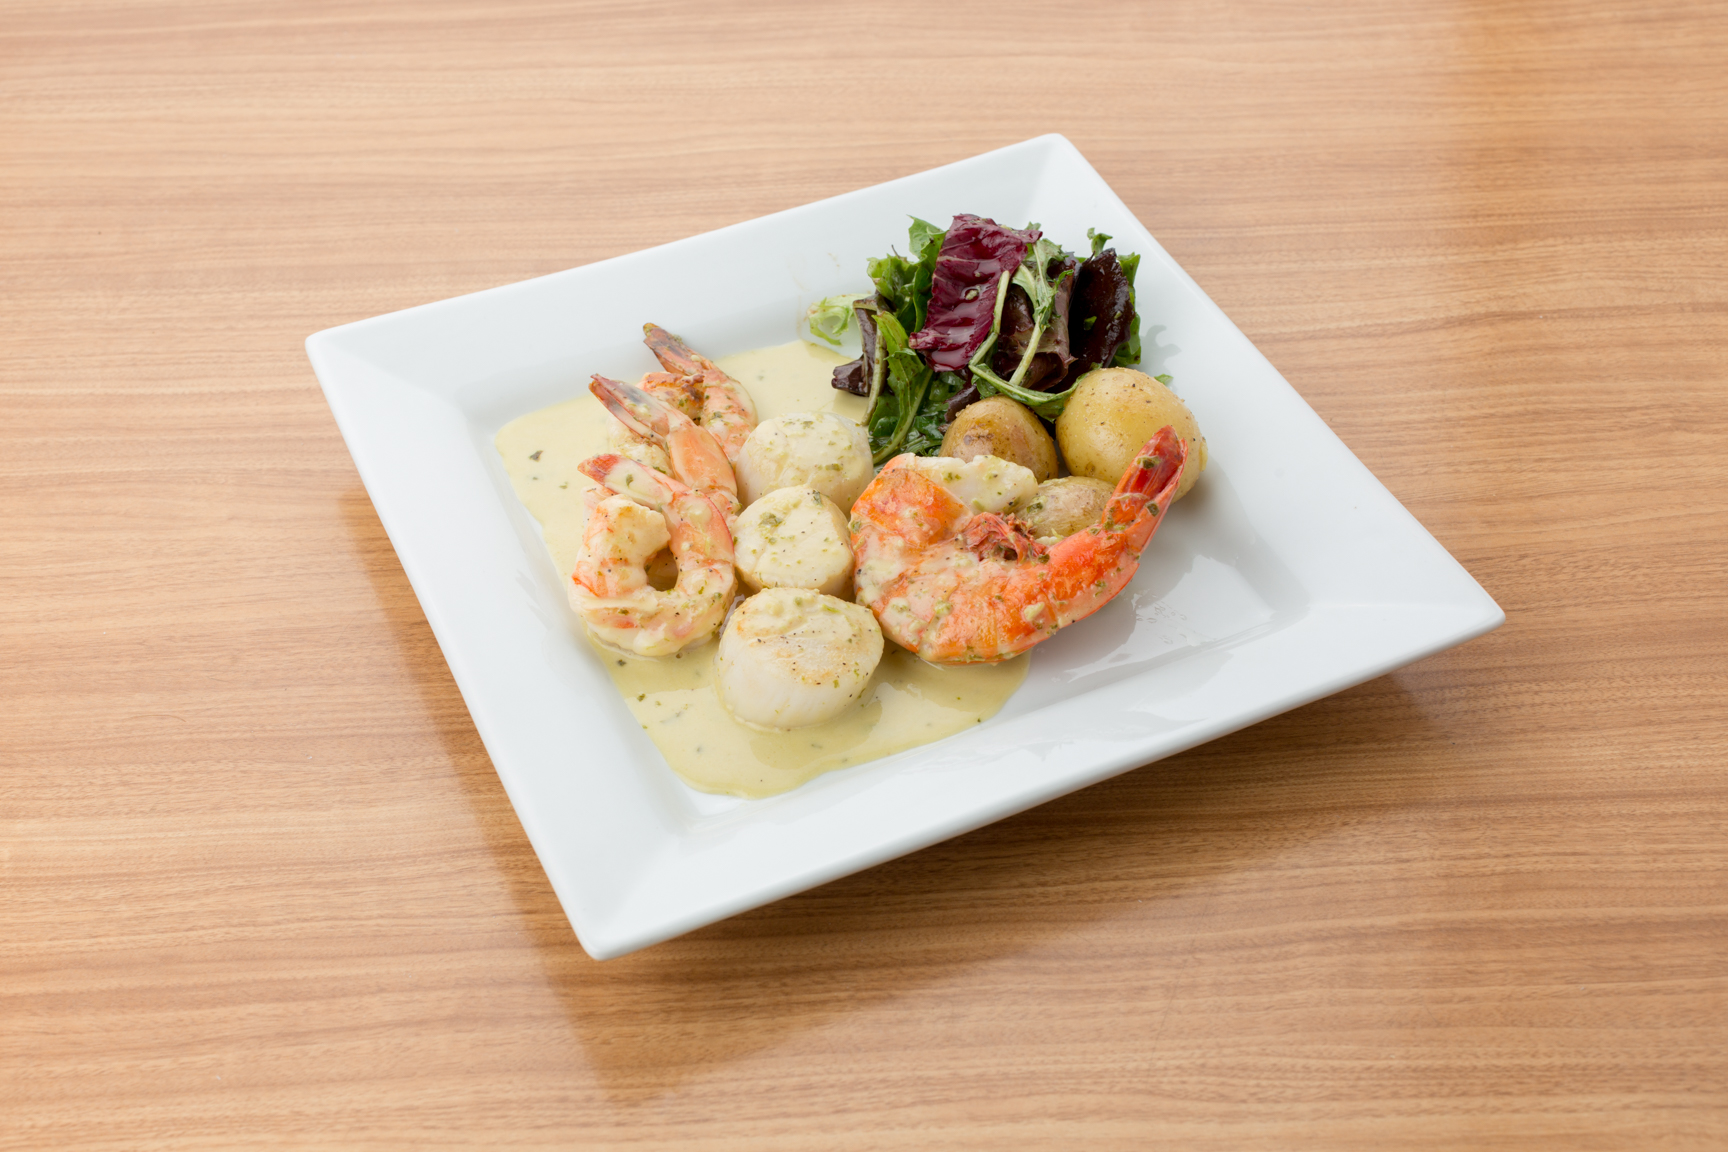 Joie Cafe Shrimp dish photography by marlboro wang photo